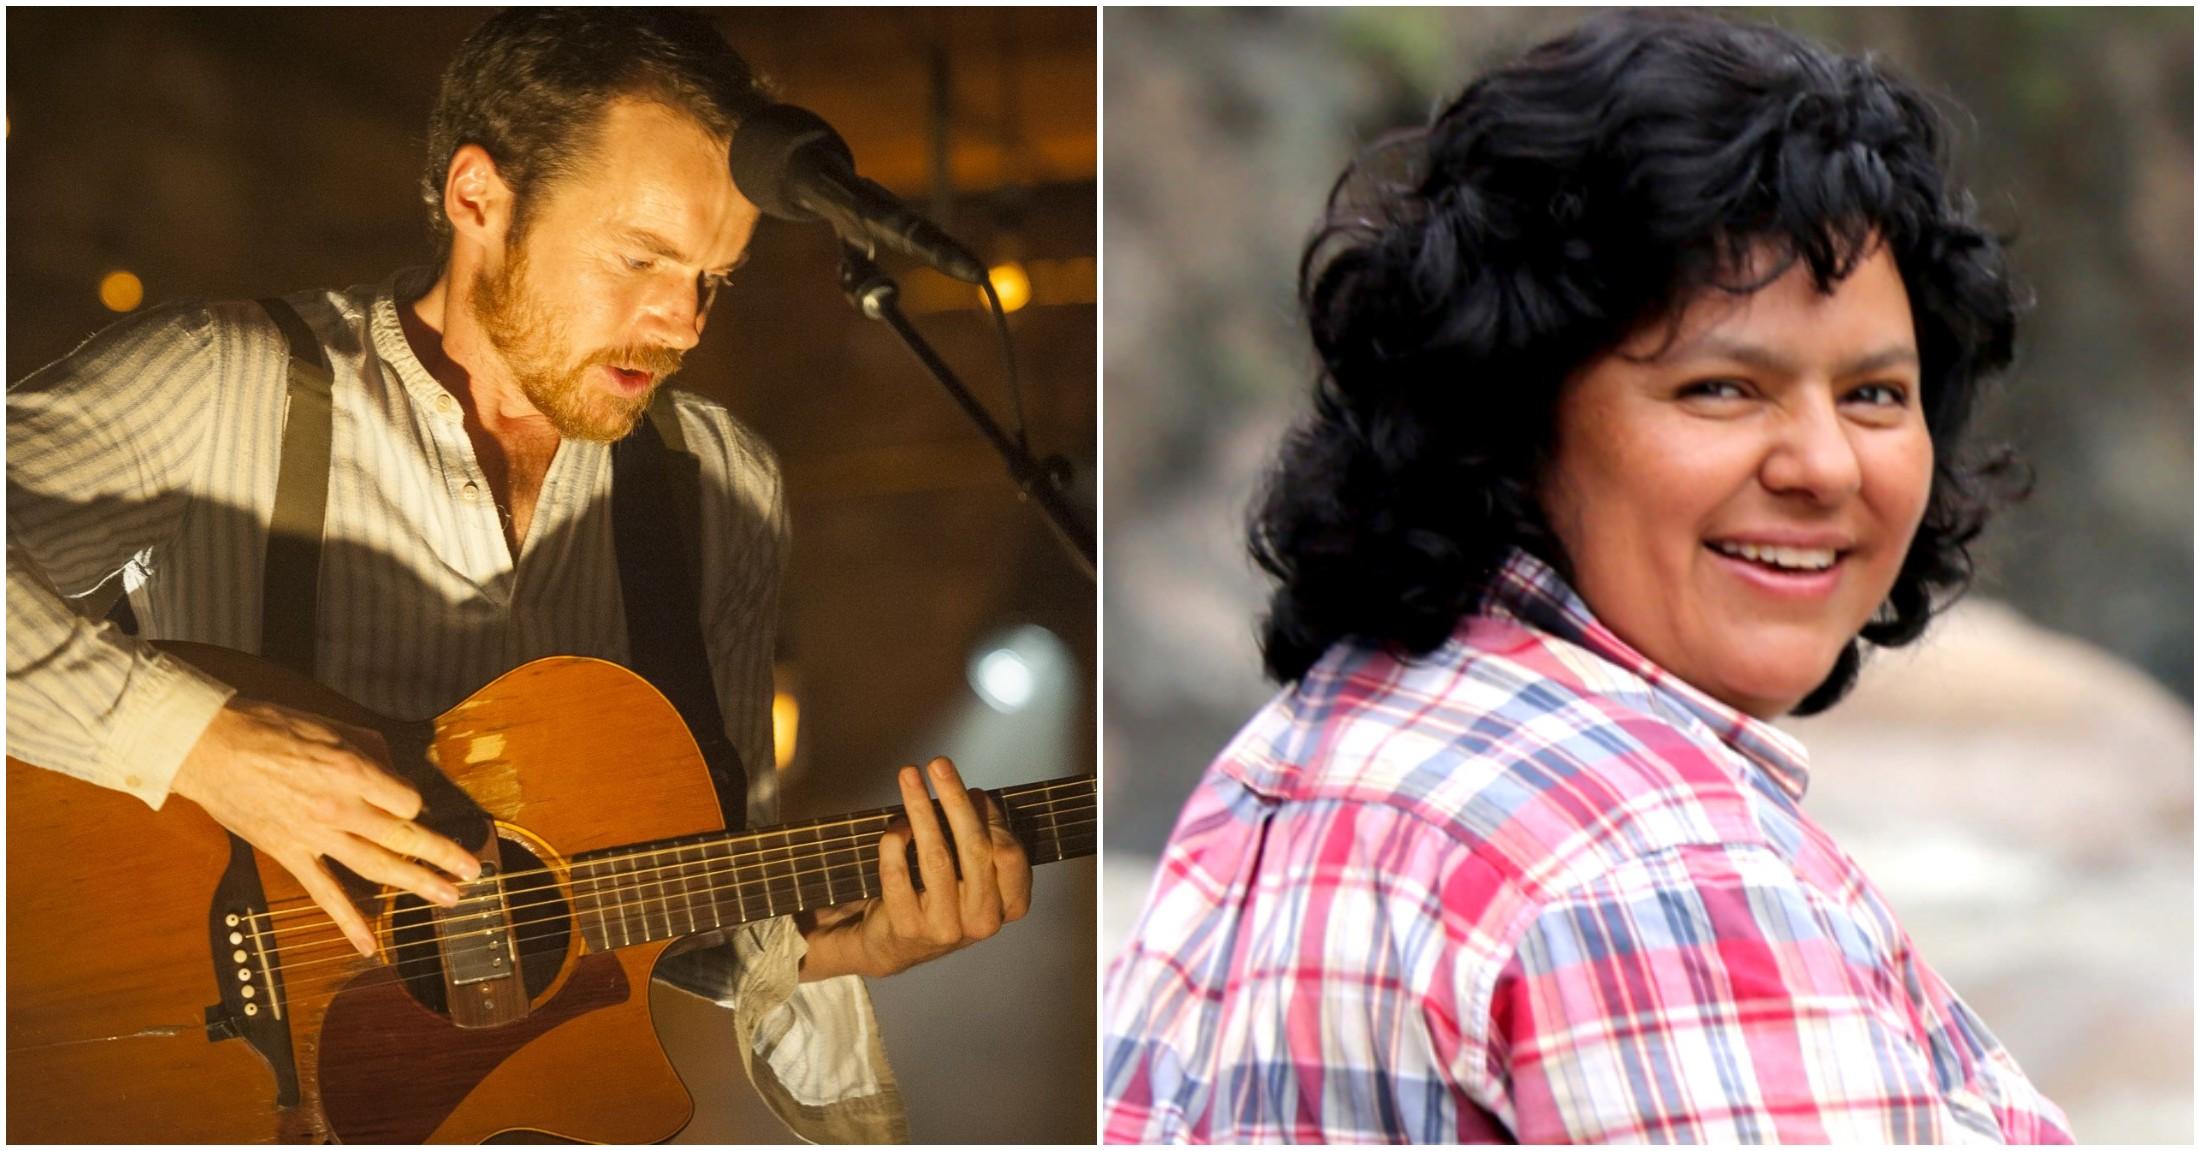 Músico irlandés Damien Rice dedica canción a Berta Cáceres